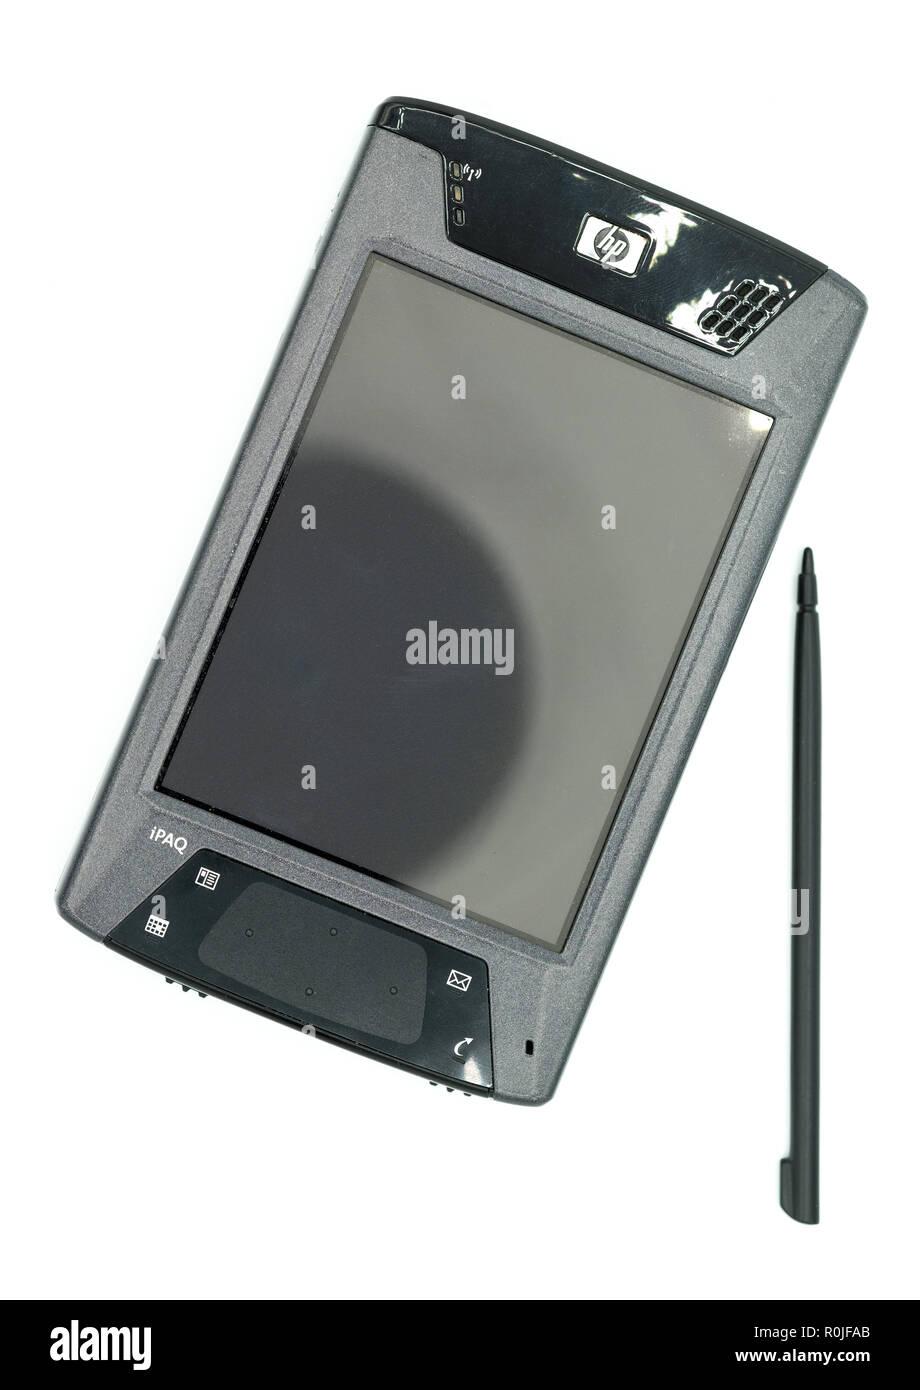 HP iPaq hx4700 PDA with stylus - Stock Image